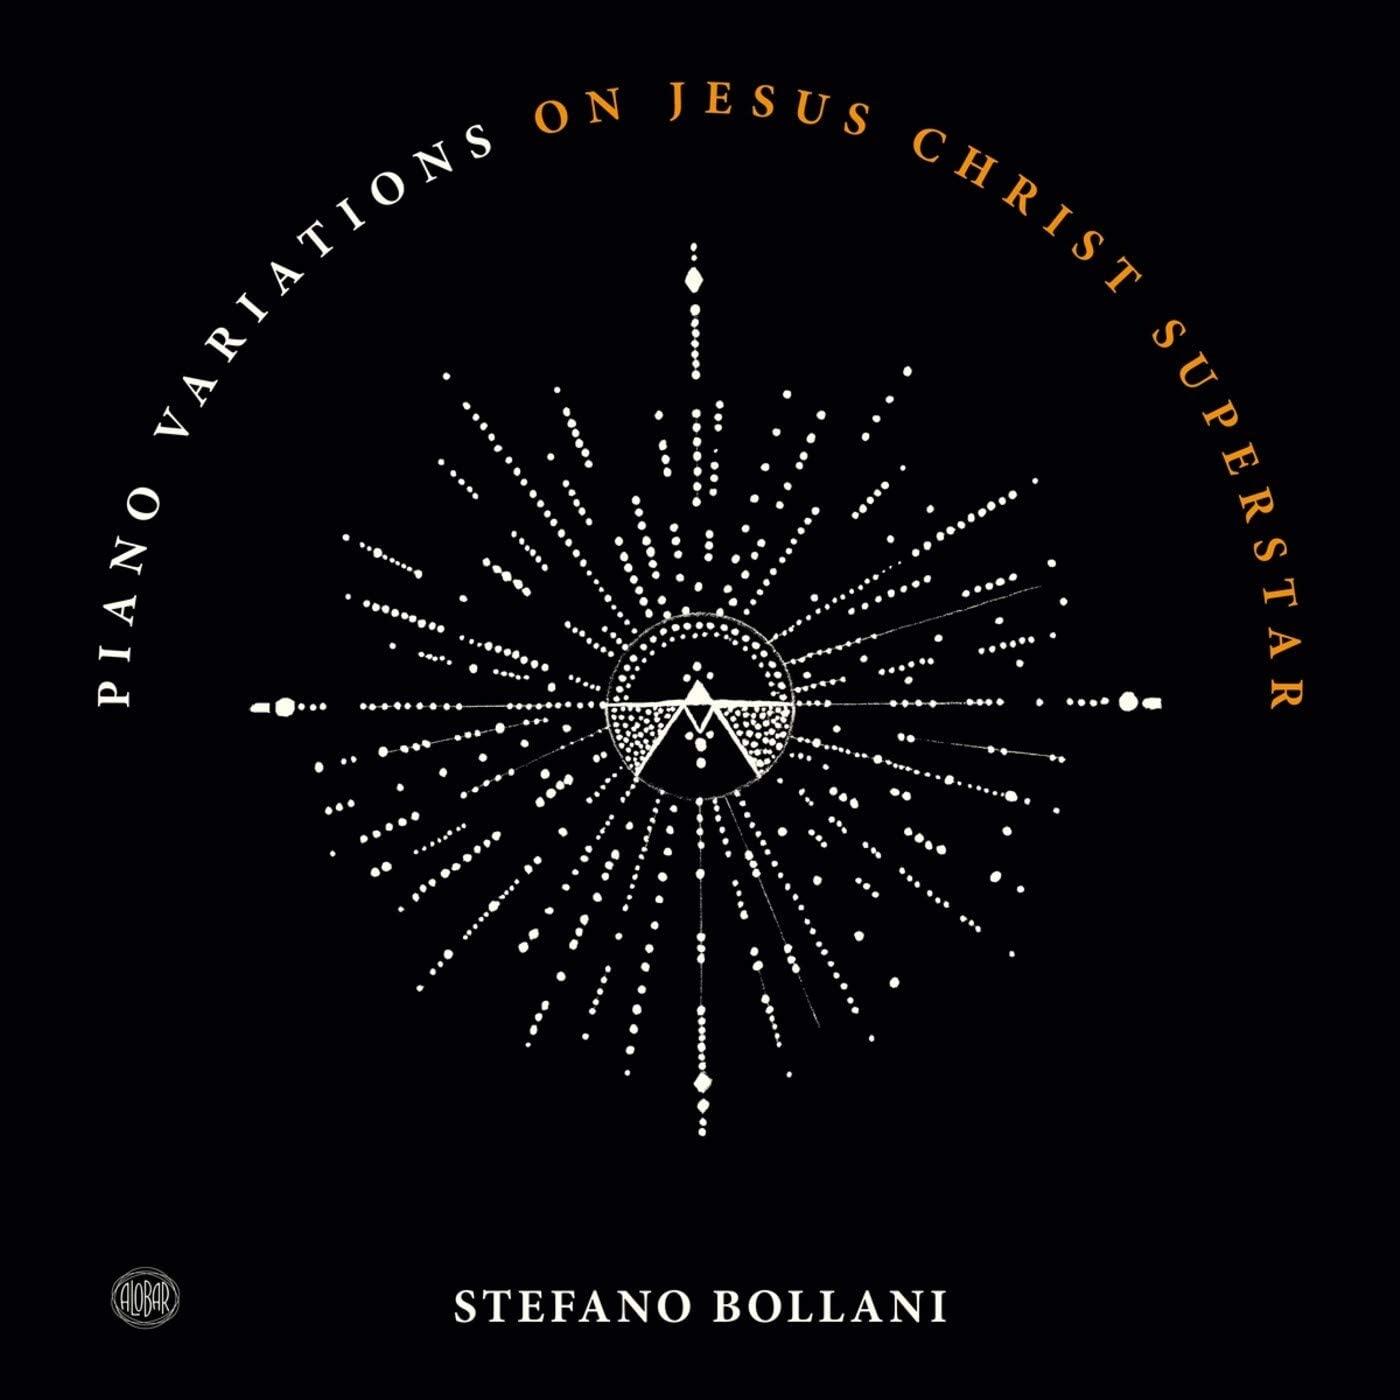 Copertina Vinile 33 giri Piano variations  di Stefano Bollani